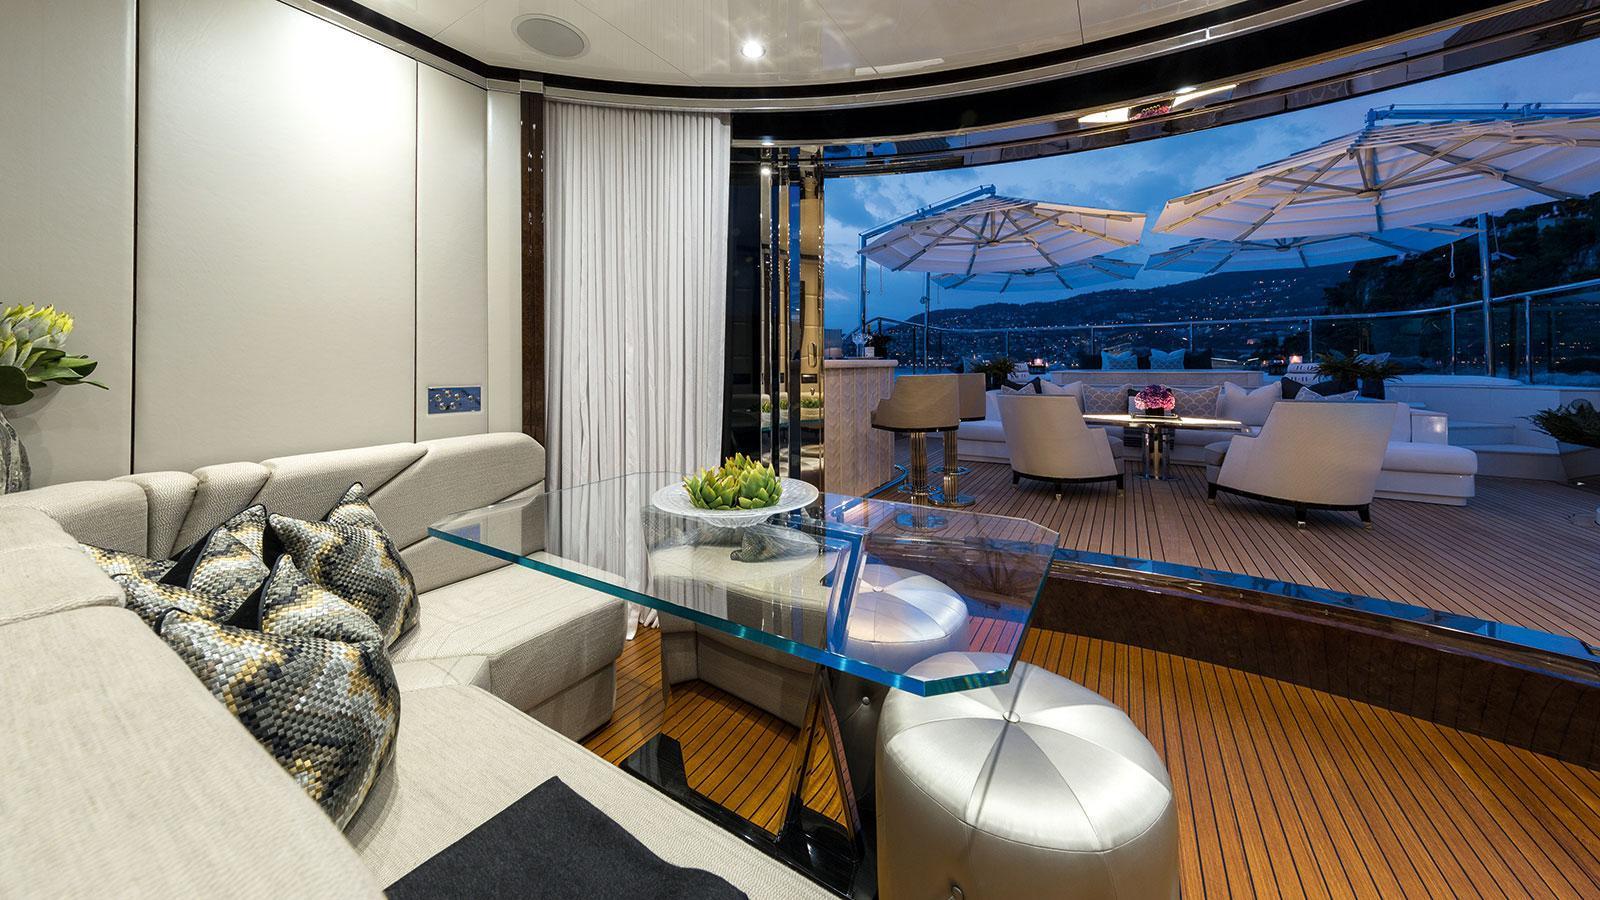 1111-motor-yacht-benetti-2015-63m-deck-lounge